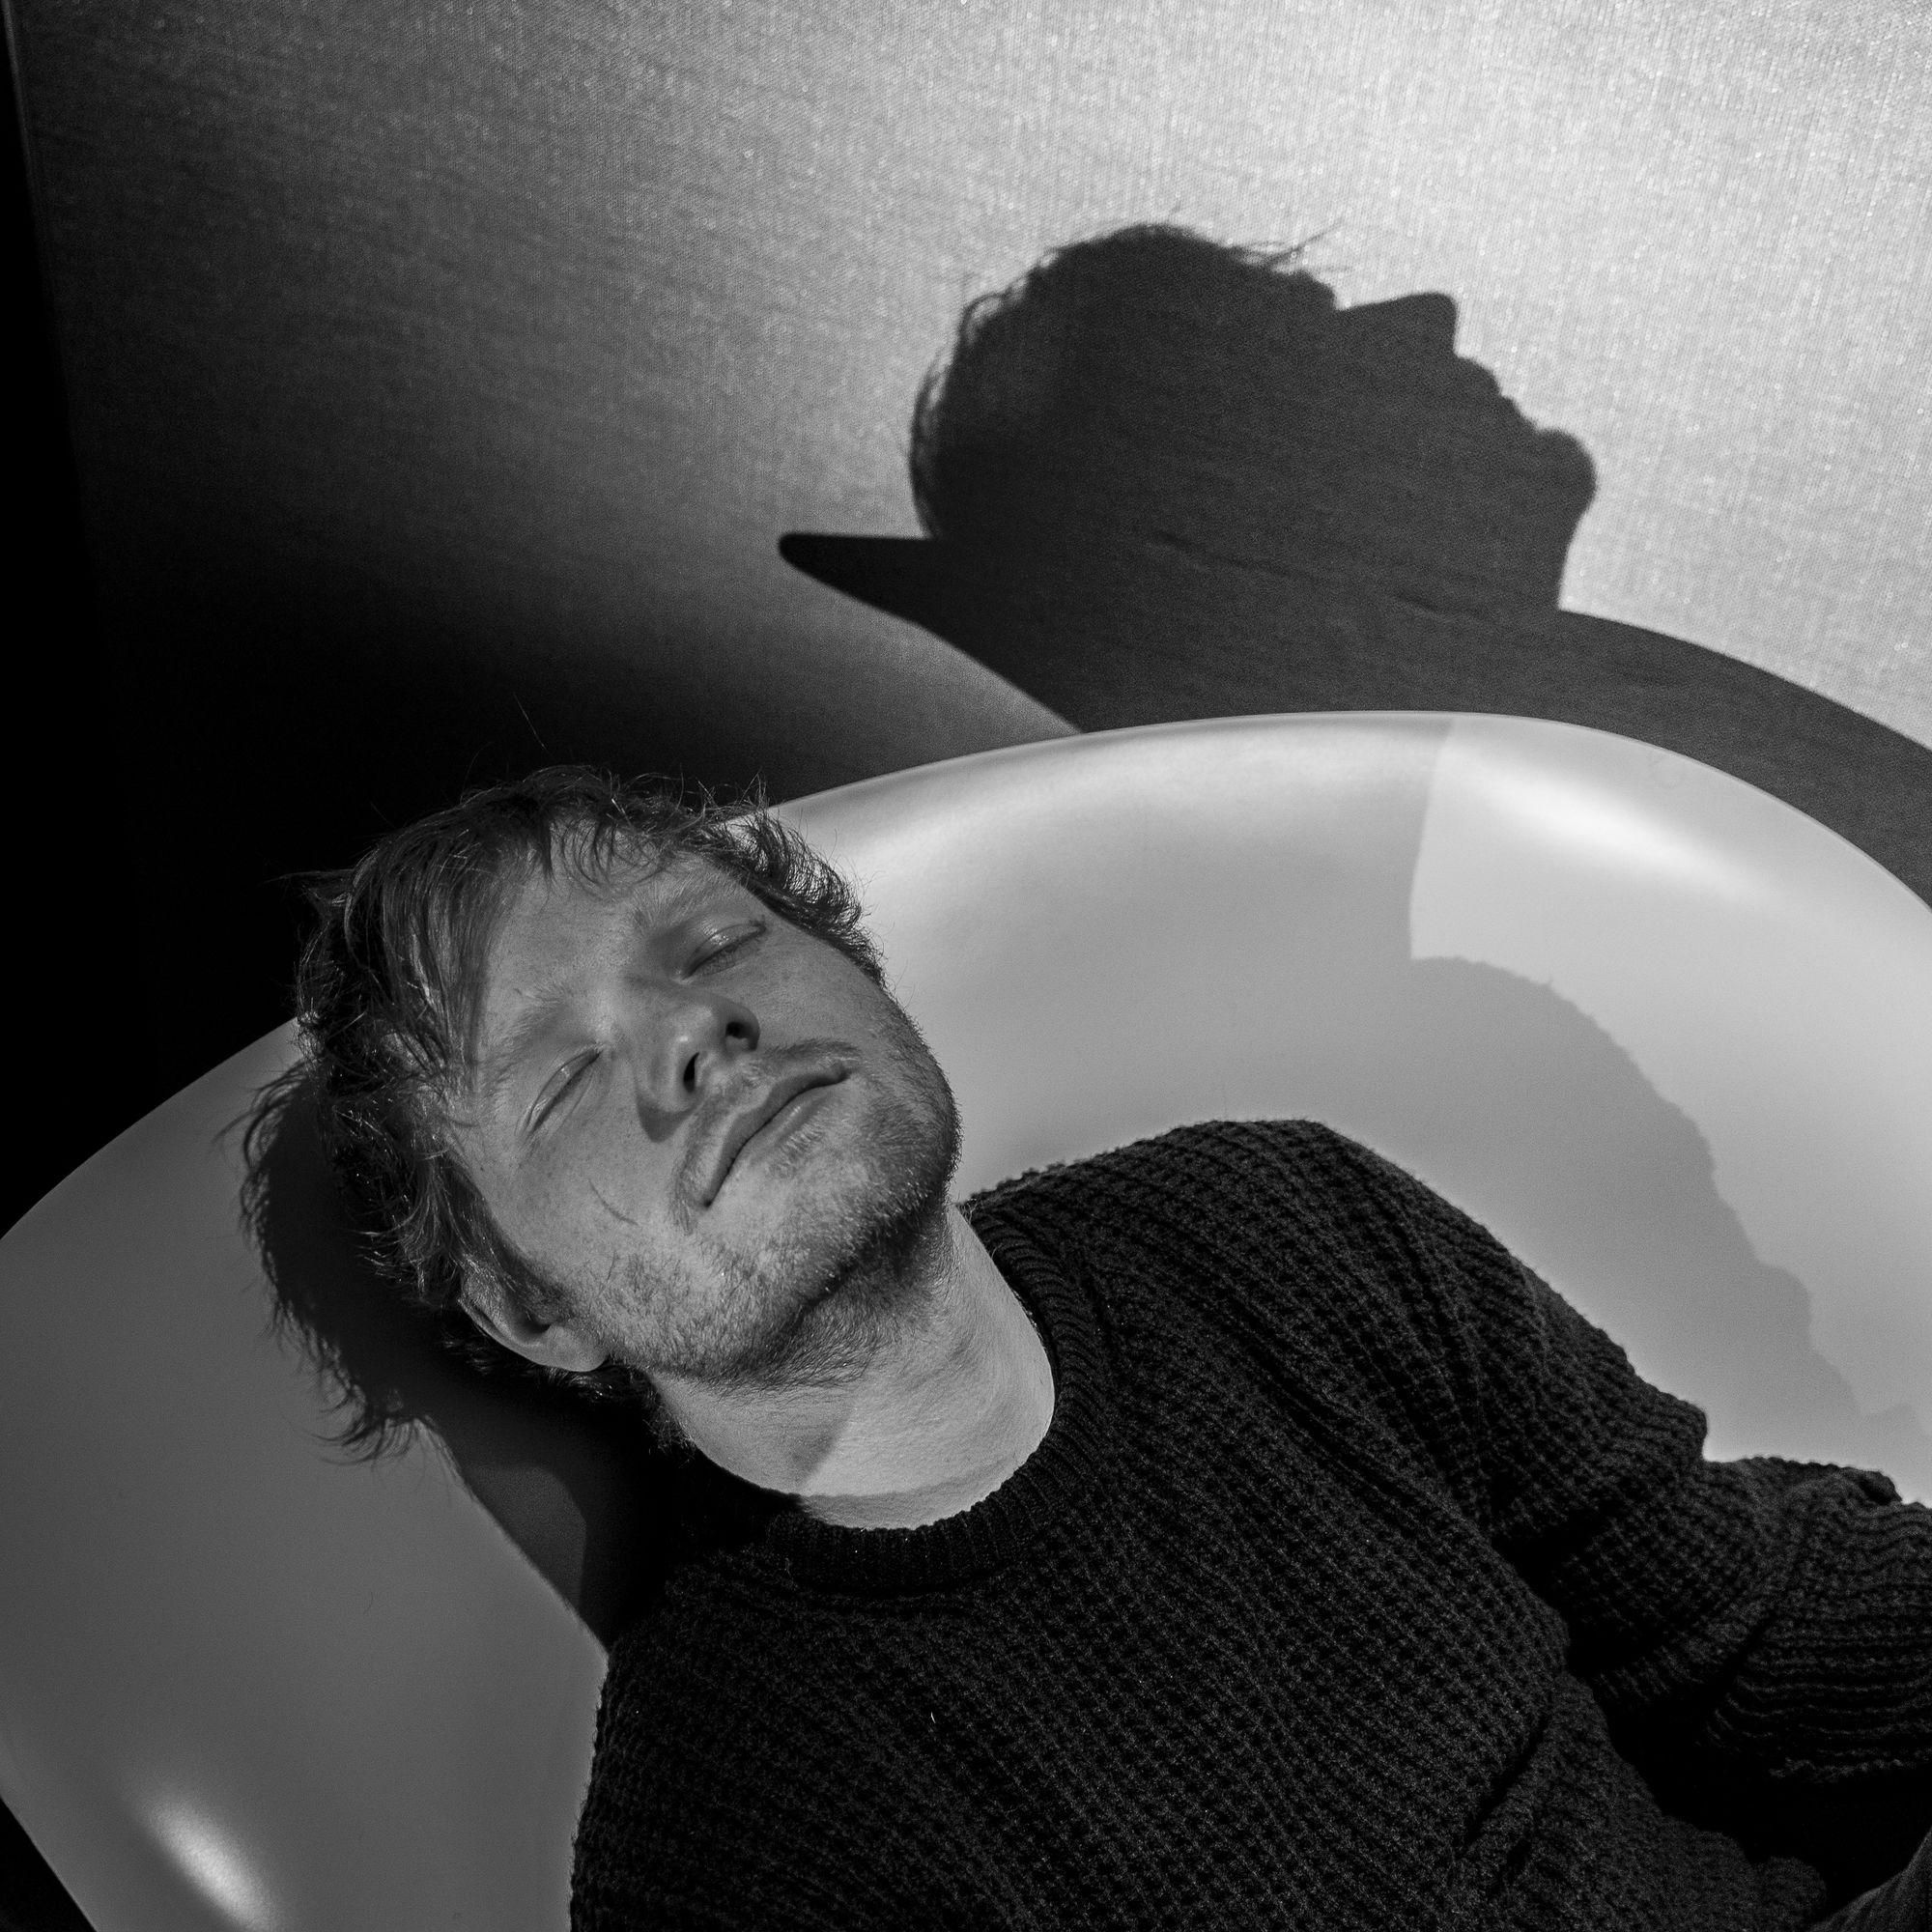 Jonas Holthaus c/o Freda+Woolf photographed Ed Sheeran for Zeit Magazin